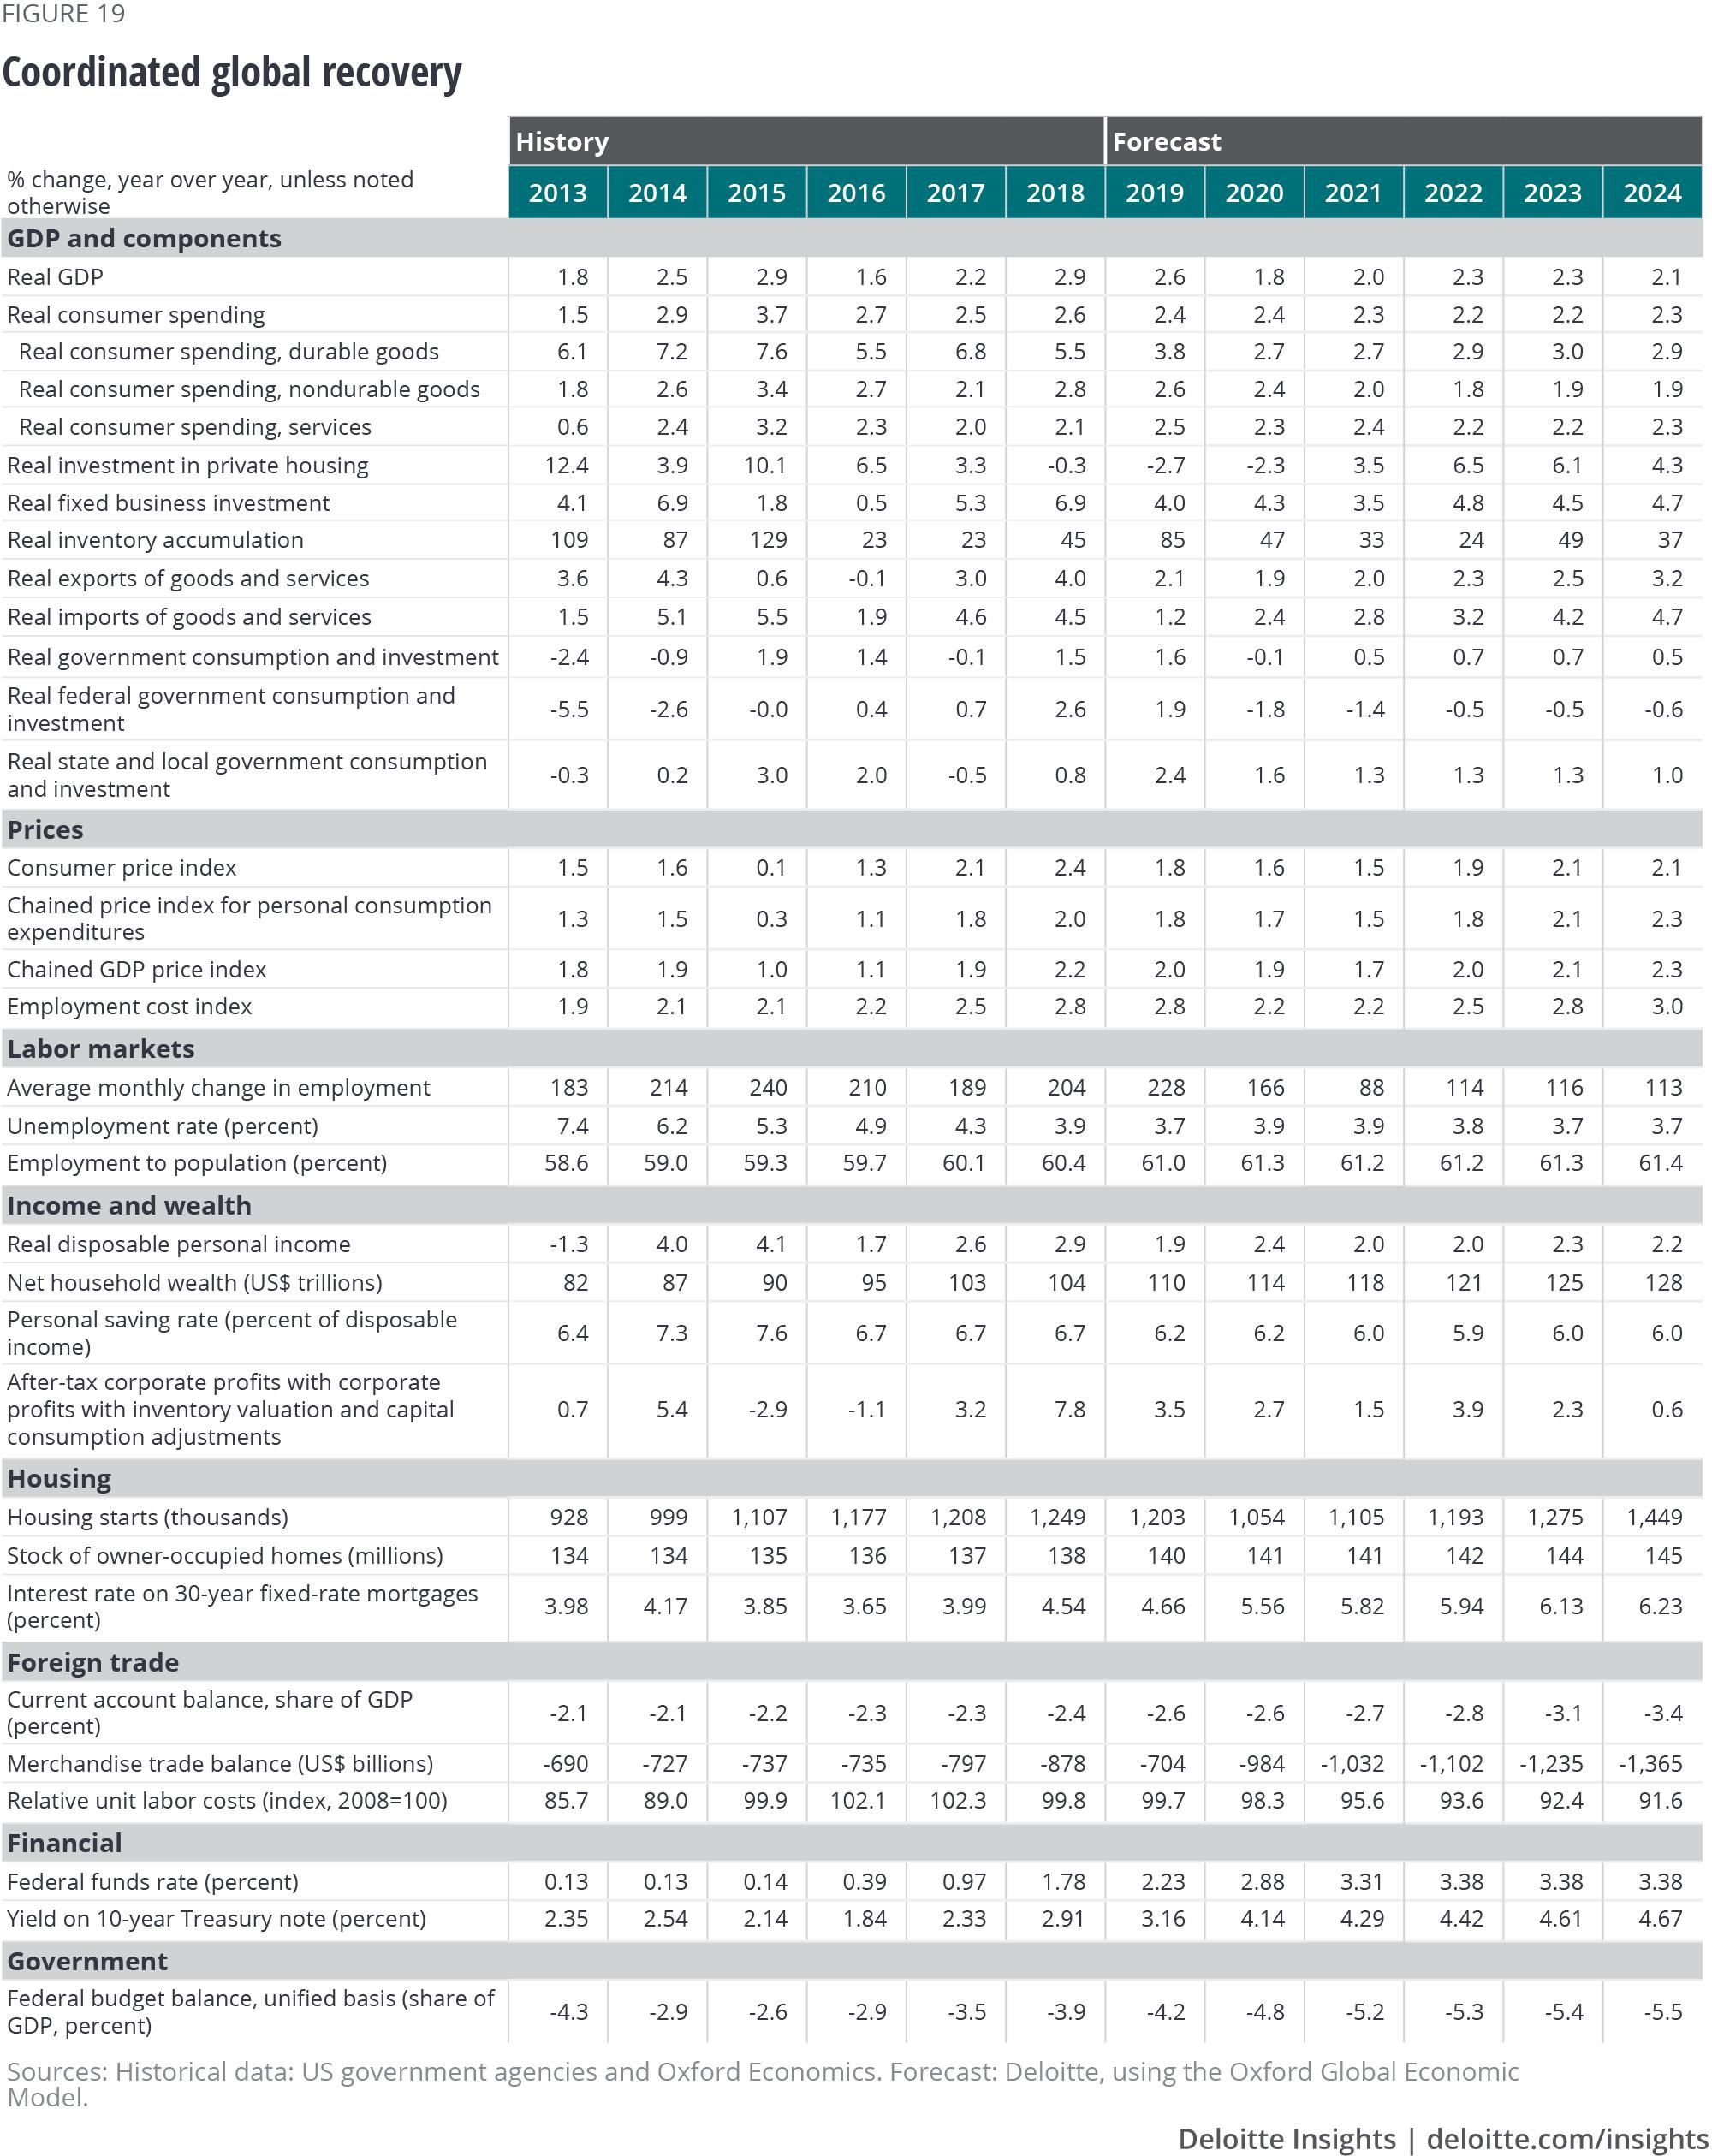 US economic forecast Q2 2019 | Deloitte Insights